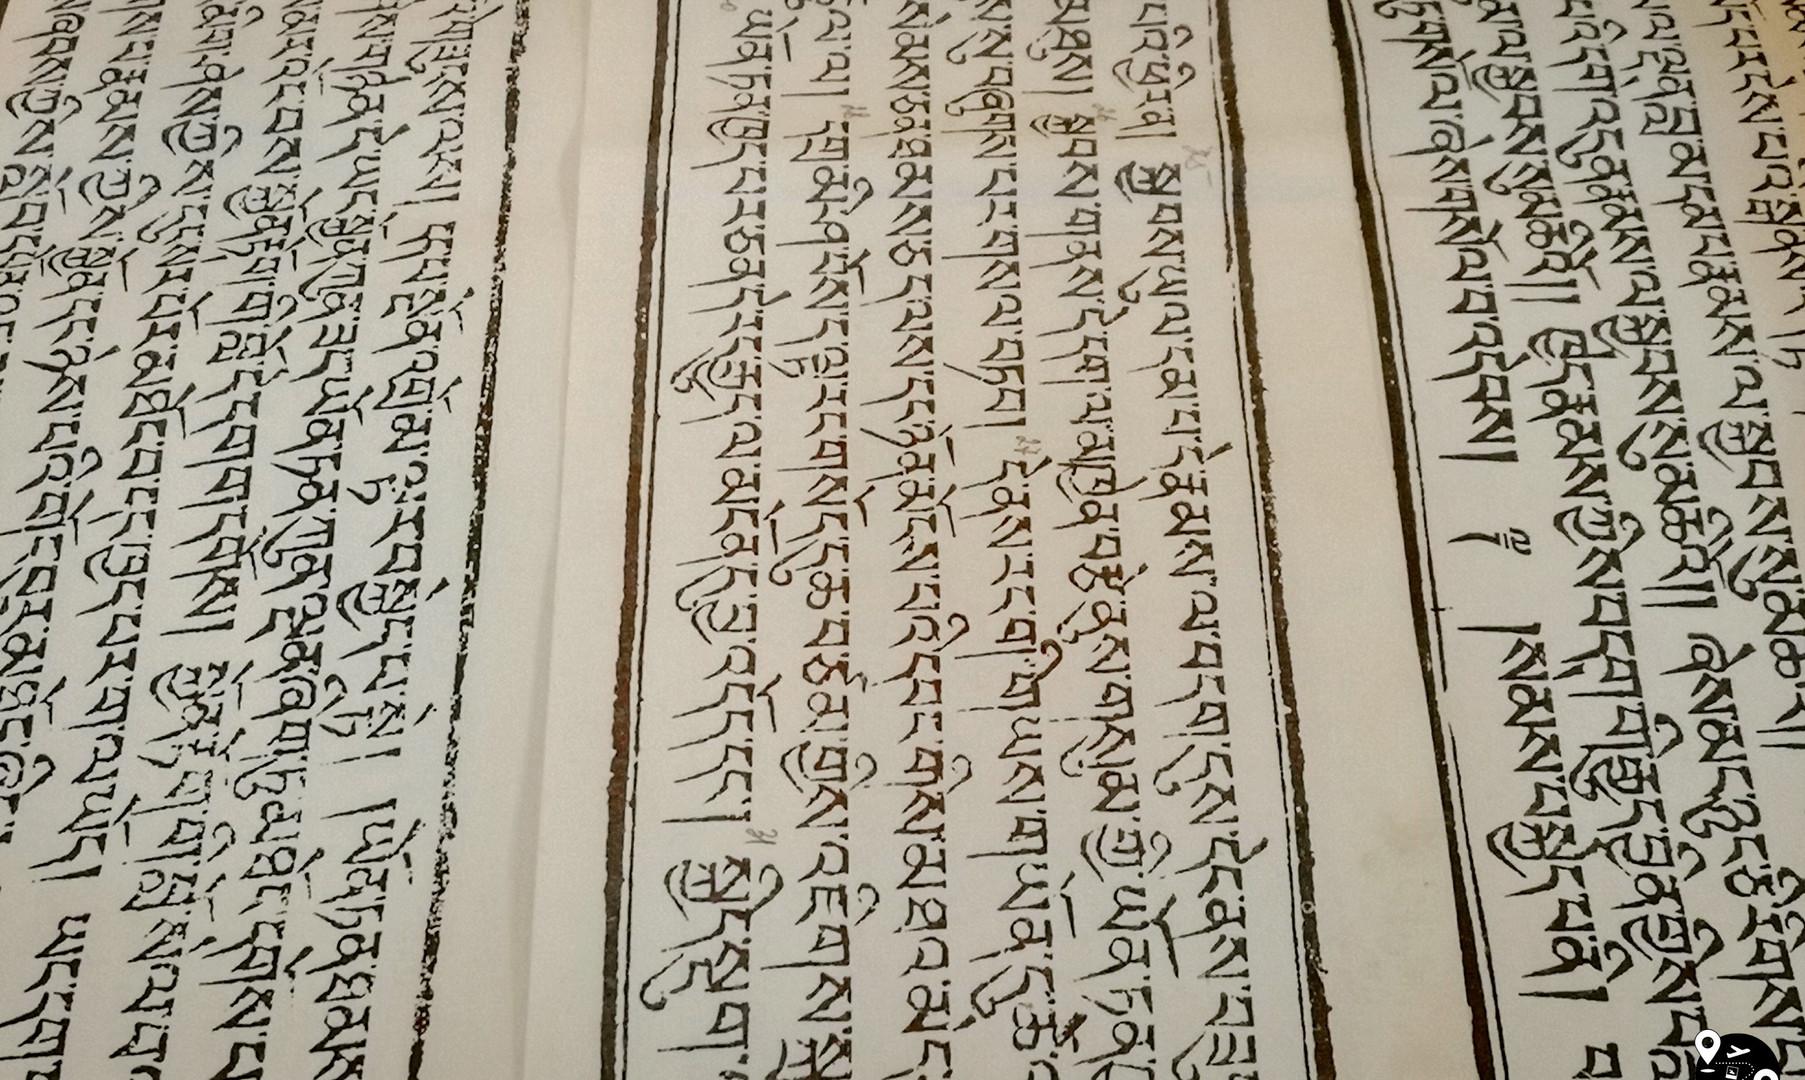 Письмена на калмыцком языке